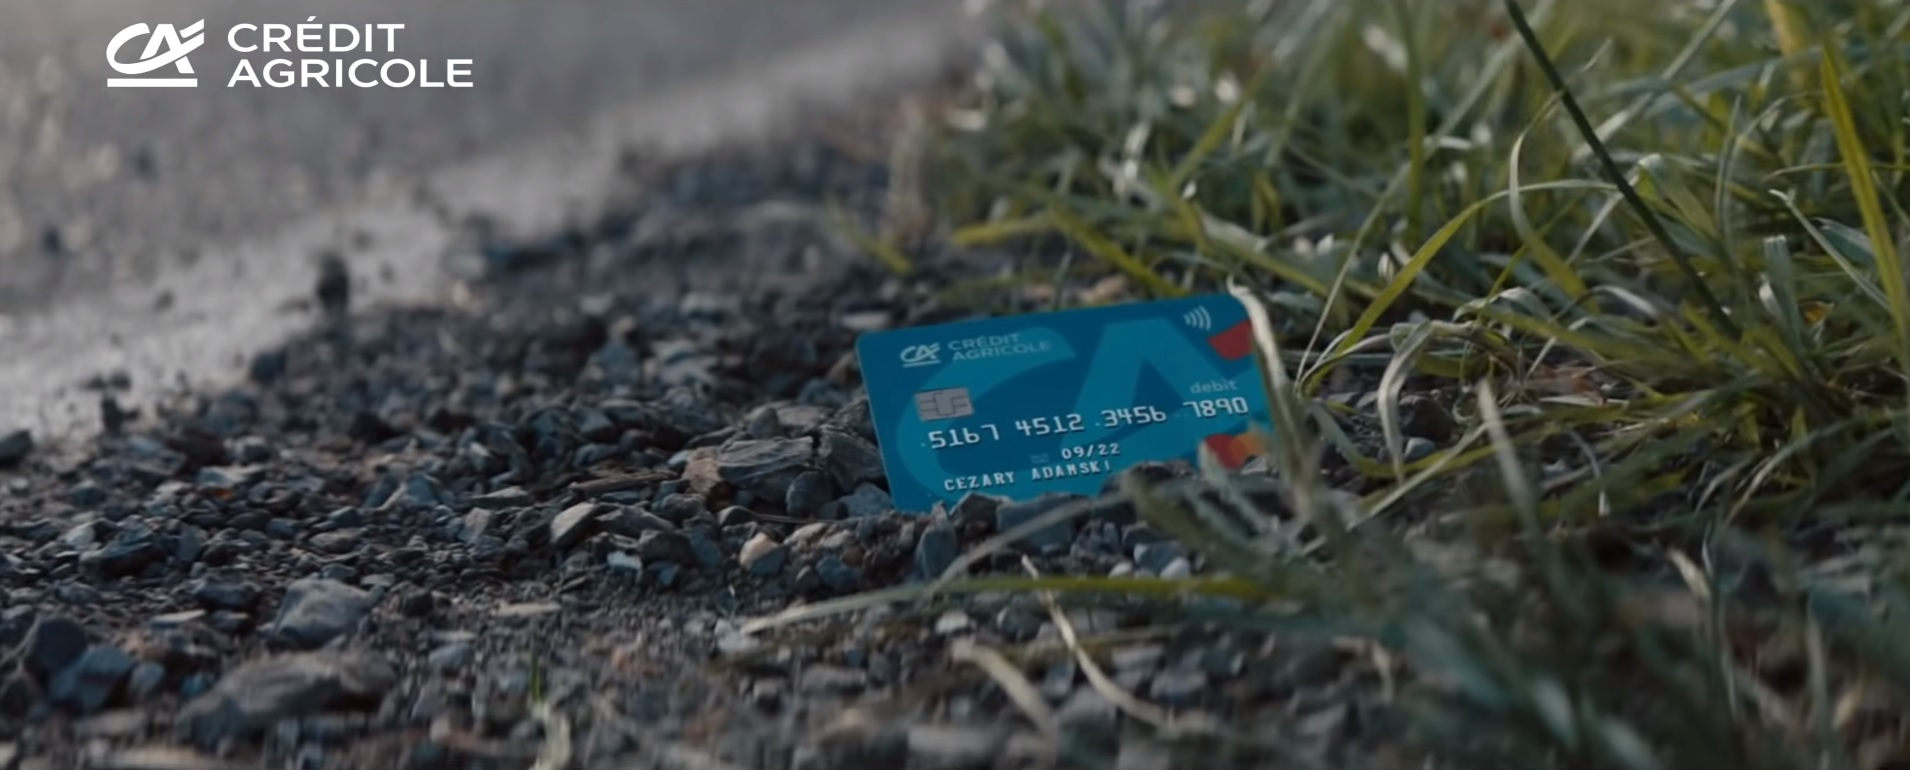 karta debetowa kredytowa Credit Agricole